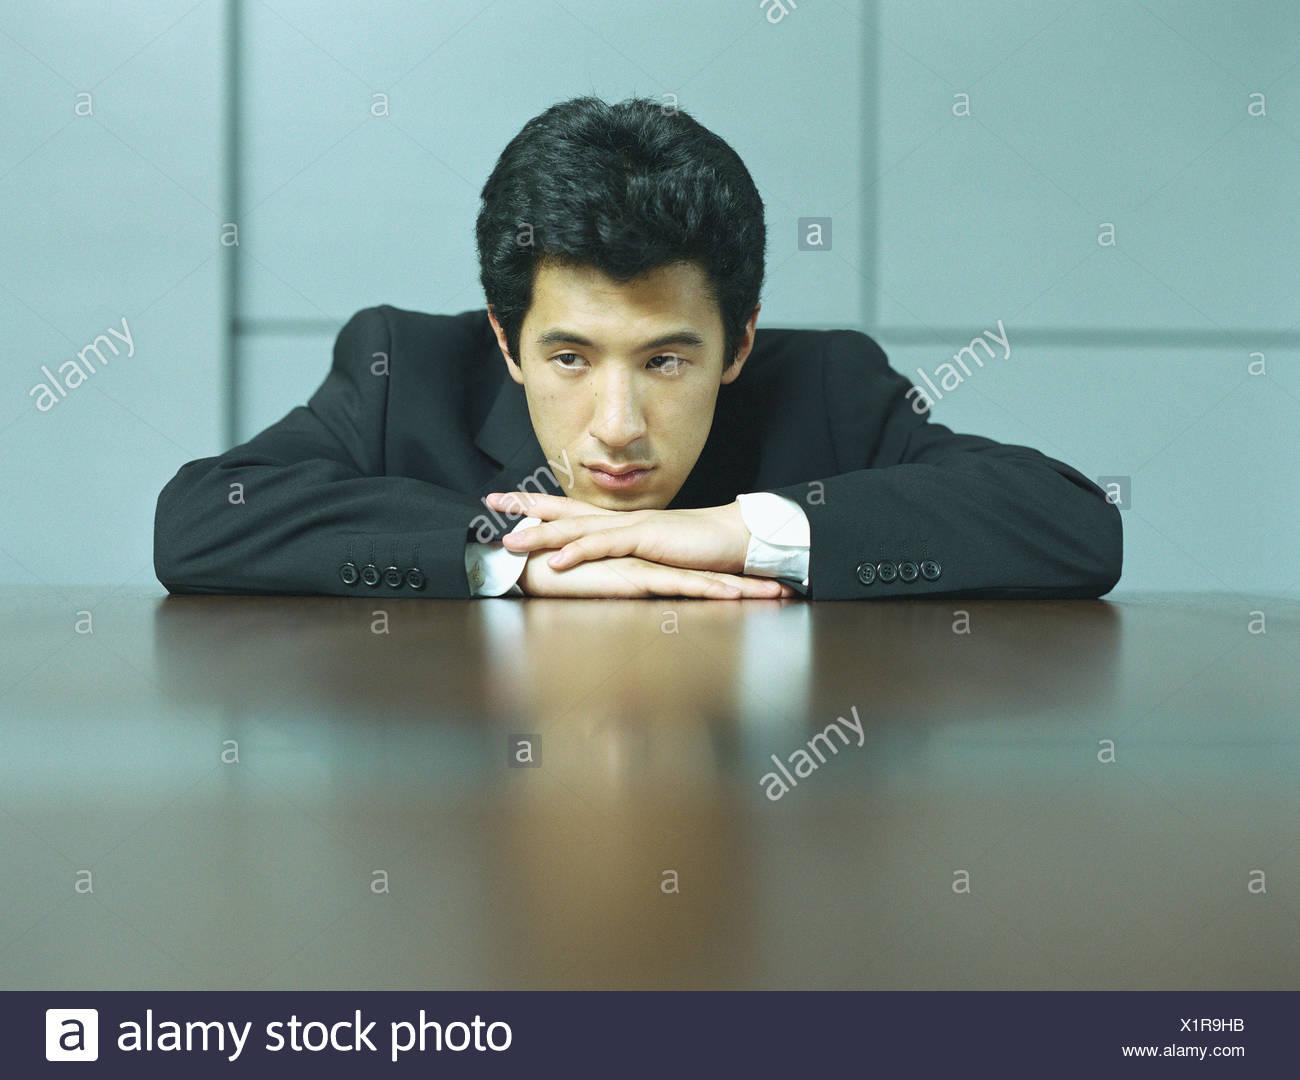 Businessman resting head on hands, portrait - Stock Image